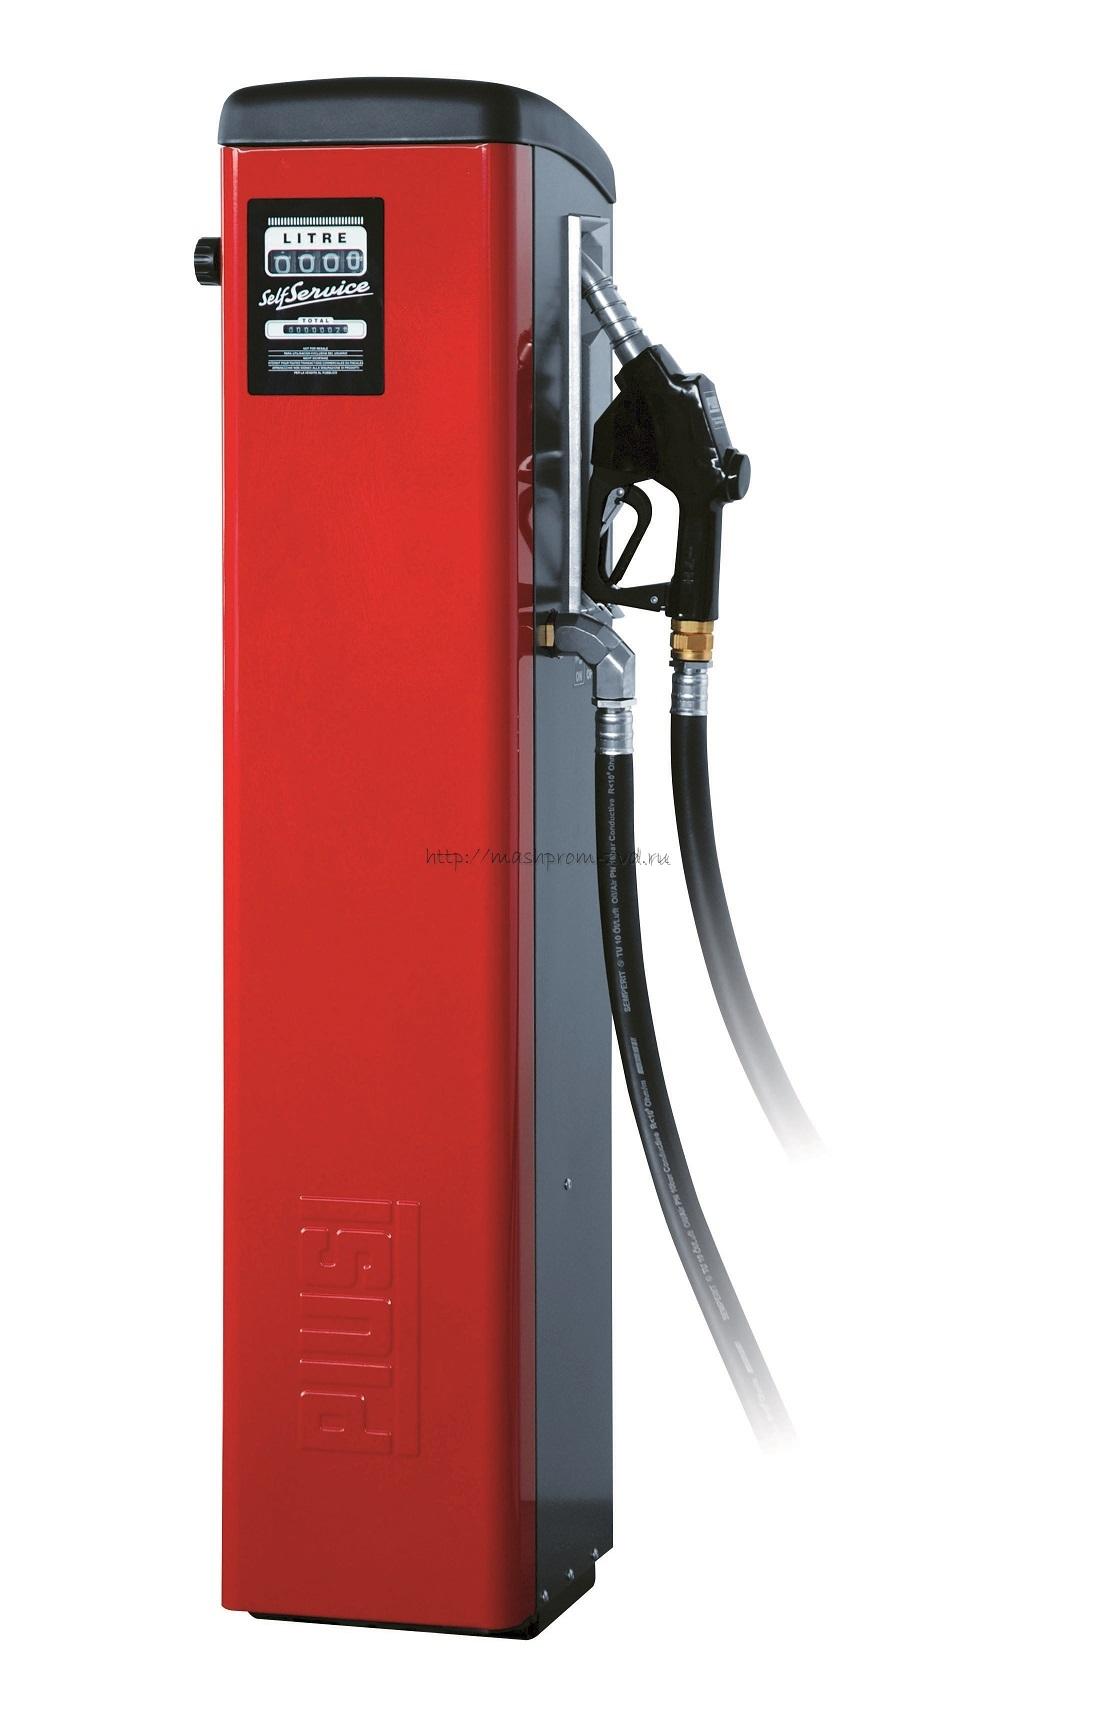 Self Service 70 K44 Tank Pulser арт. F00737B2B - Стационарная топливораздаточная колонка для дизельного топлива